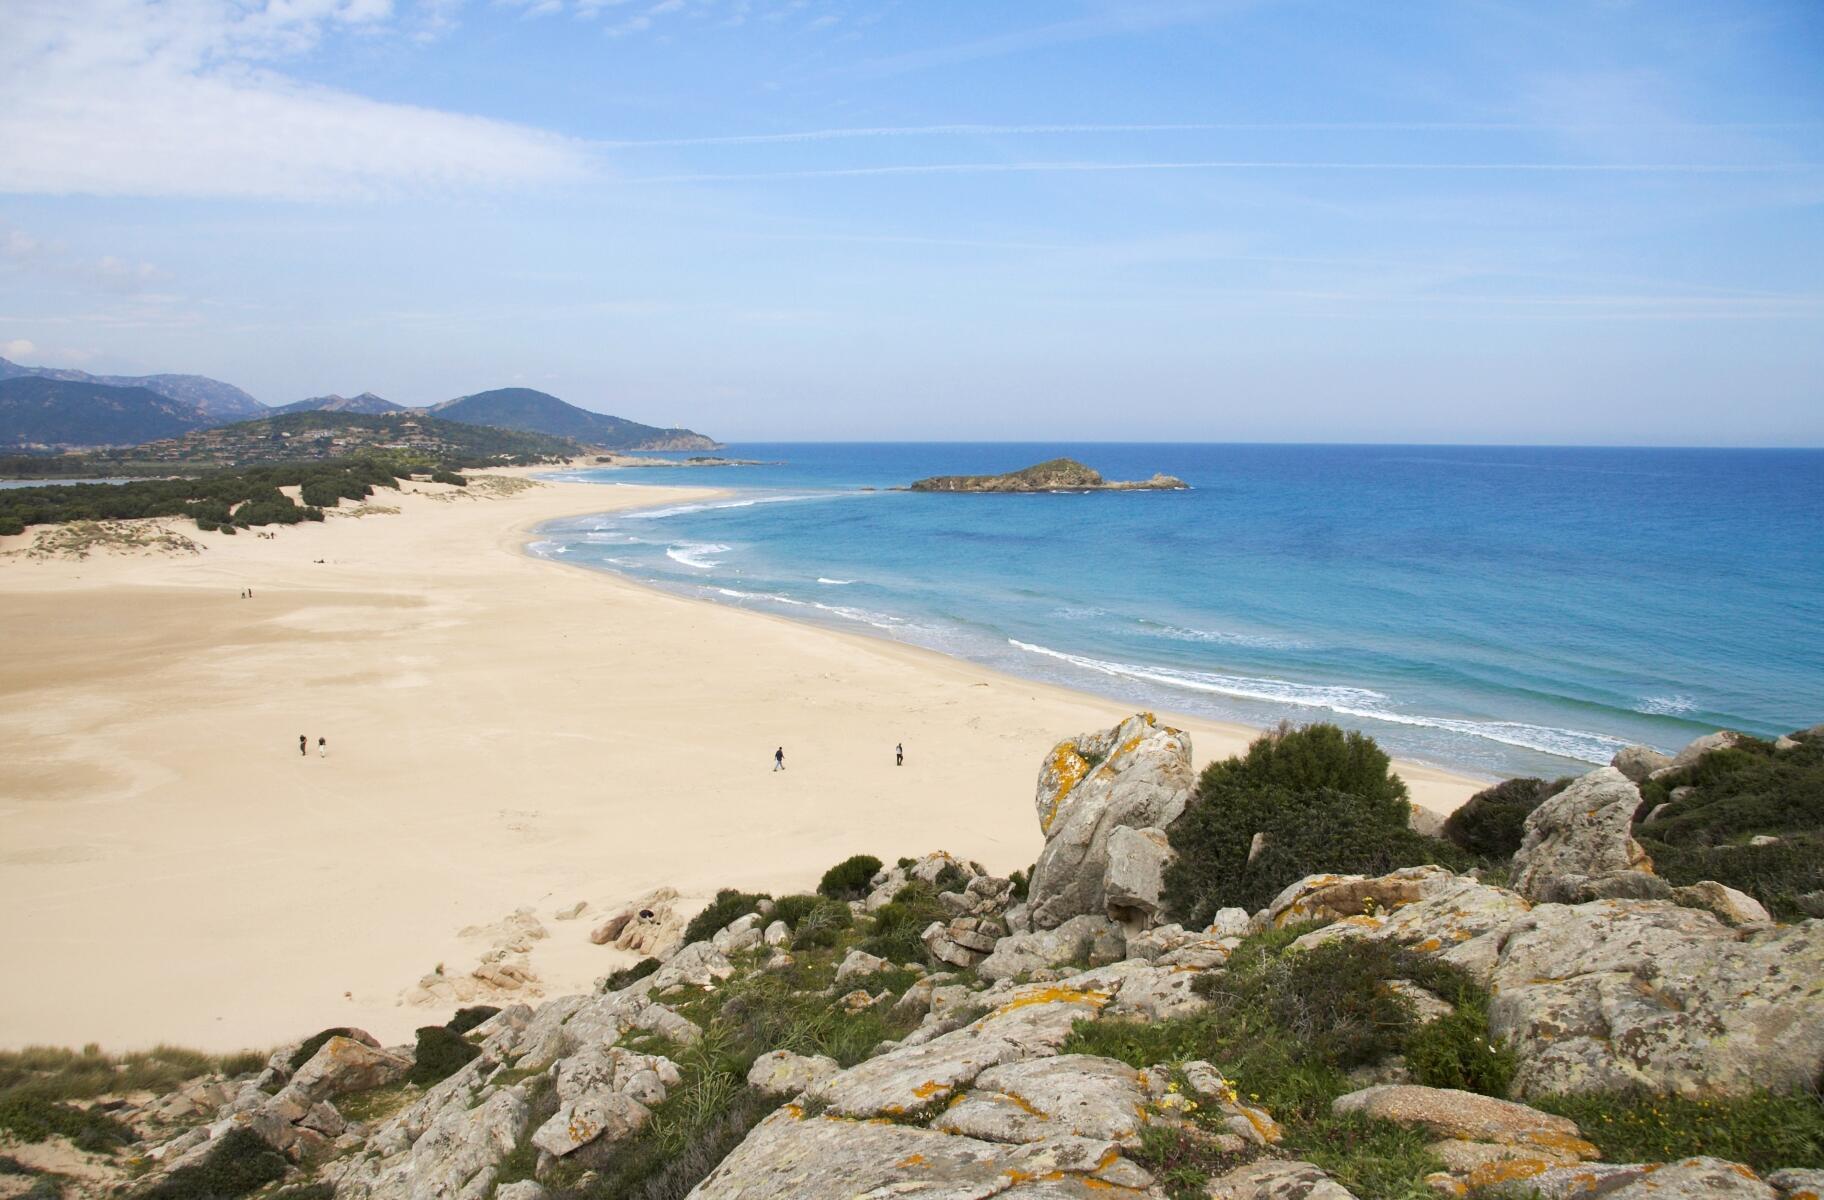 O comércio ilegal de areia, pedras e conchas cresceu nos últimos anos, segundo o jornal italiano.